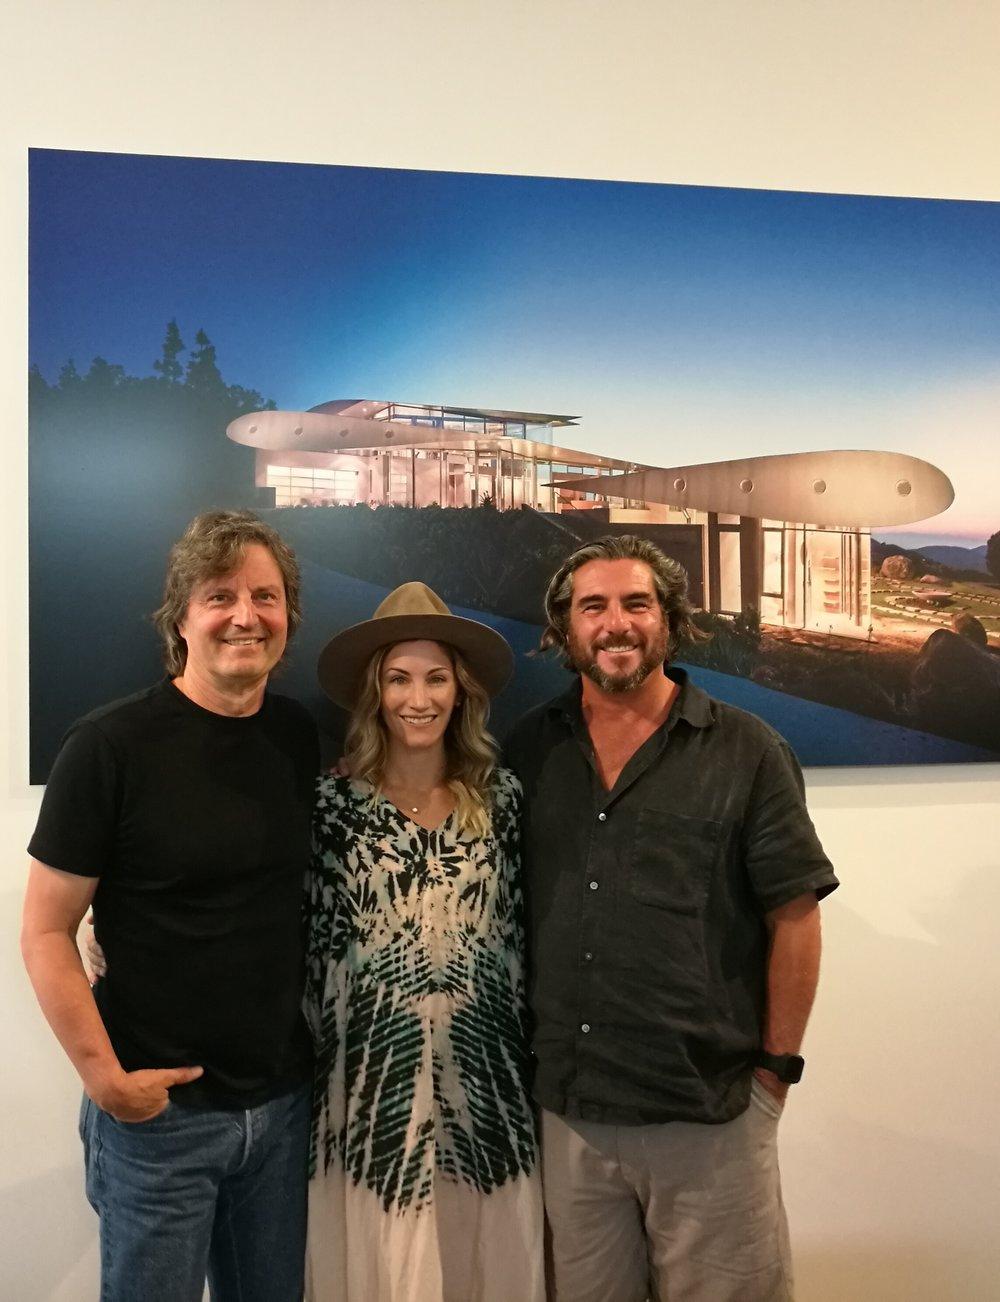 Tom Kundig, of Olson Kundig,Venice local, Kelly Furano, and David Hertz at SEA Studio